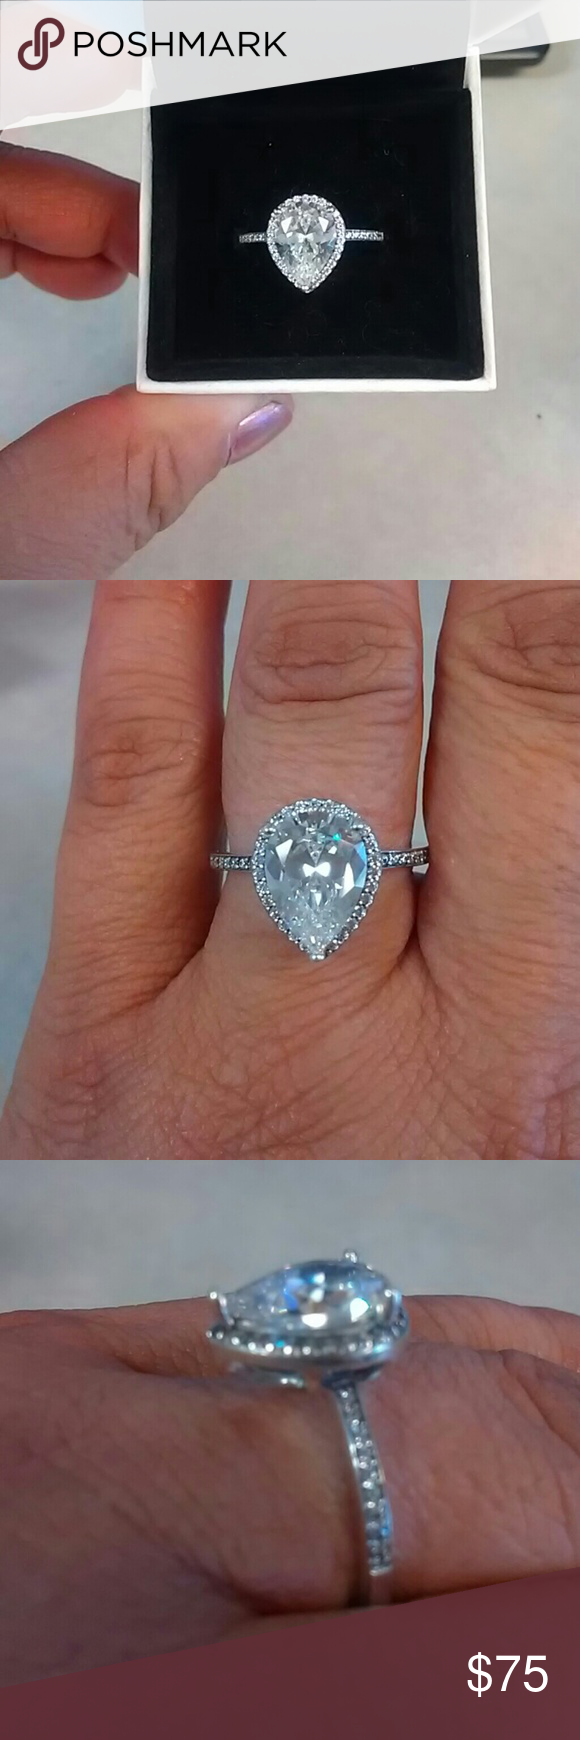 Authentic brand new Pandora Radiant Teardrop Ring Size 8 ...